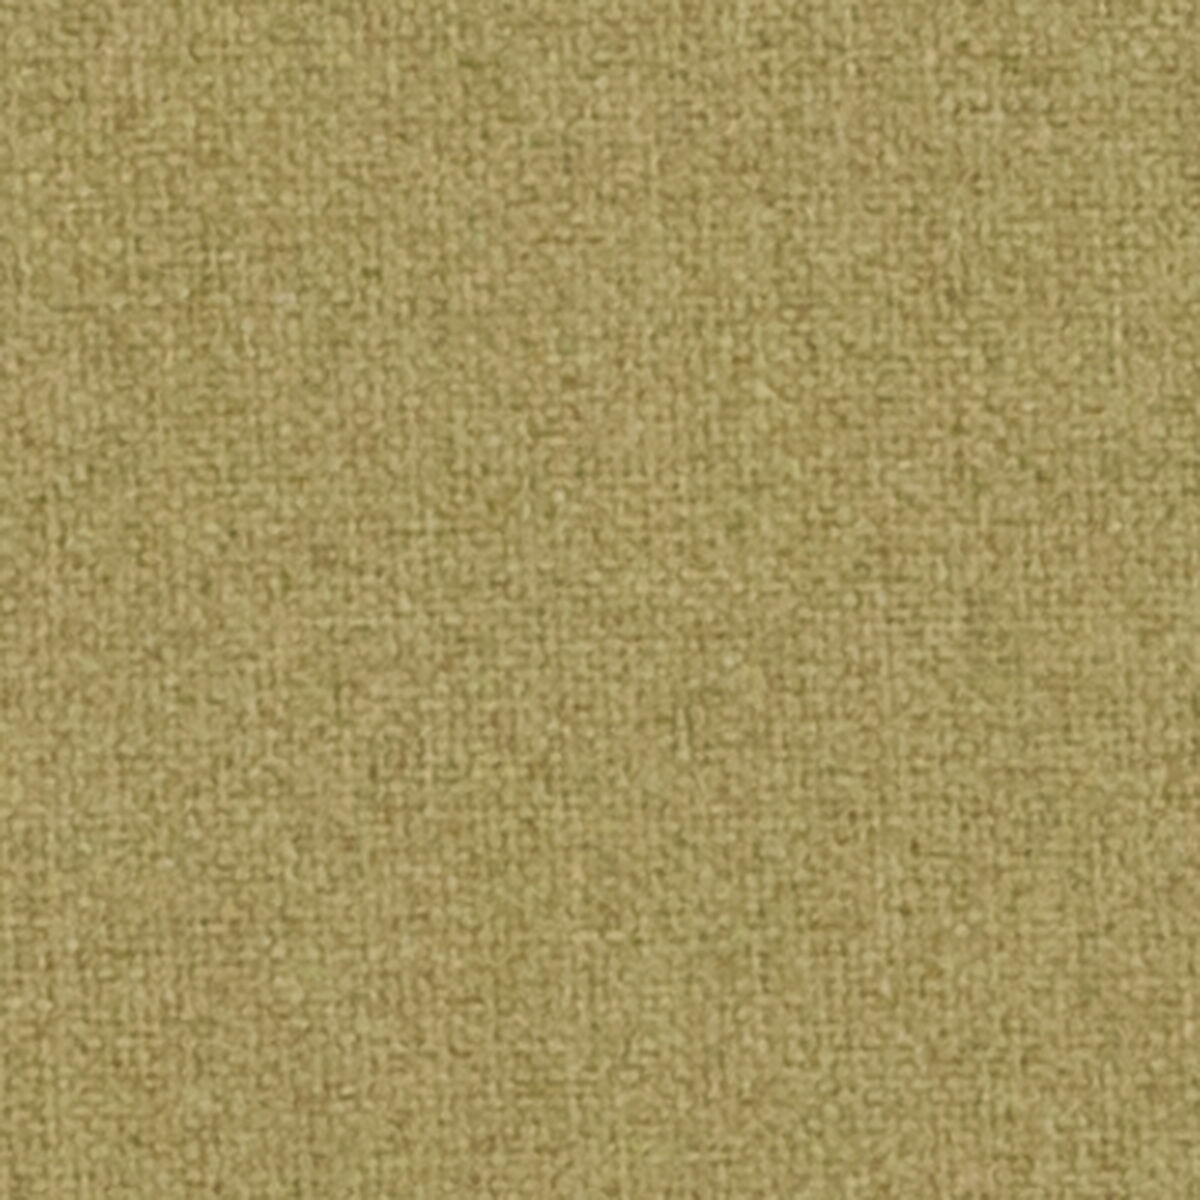 moss green fabric church chair fd ch0221 4 gv gn gg